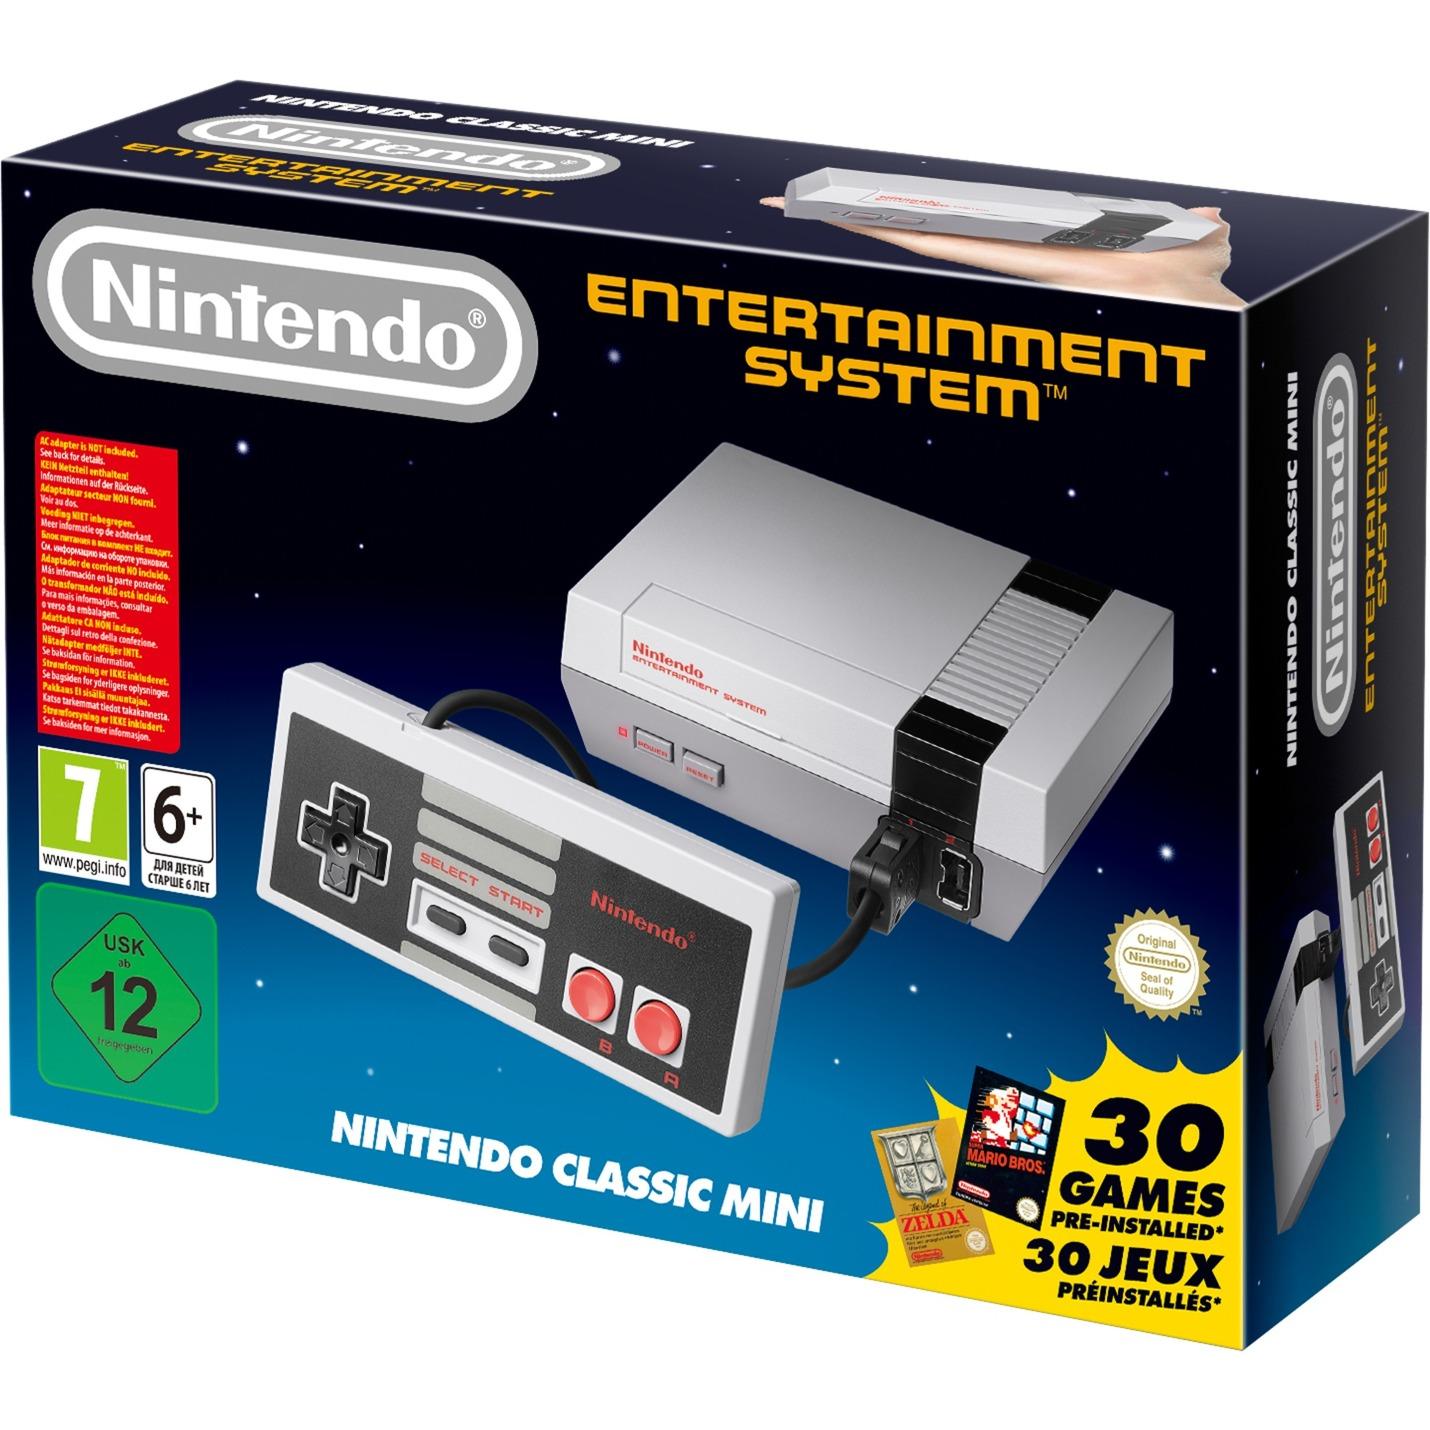 NES Classic Gris, Videoconsola